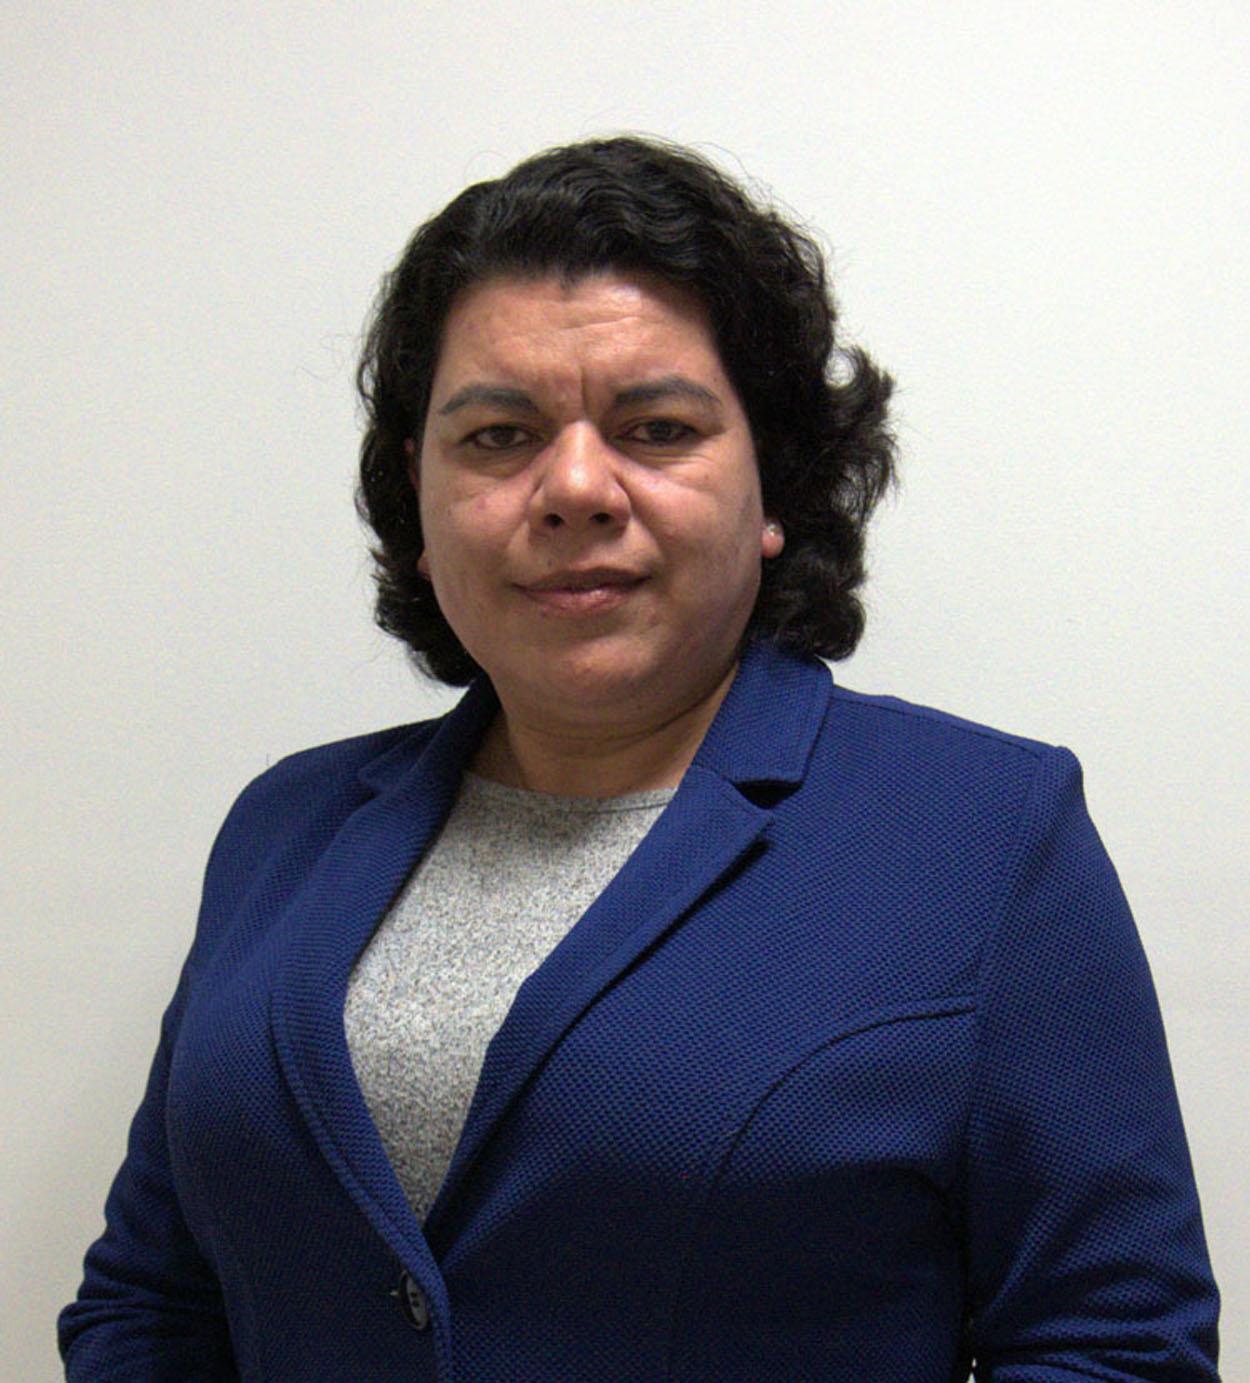 M. de Lourdes Montes Osornio